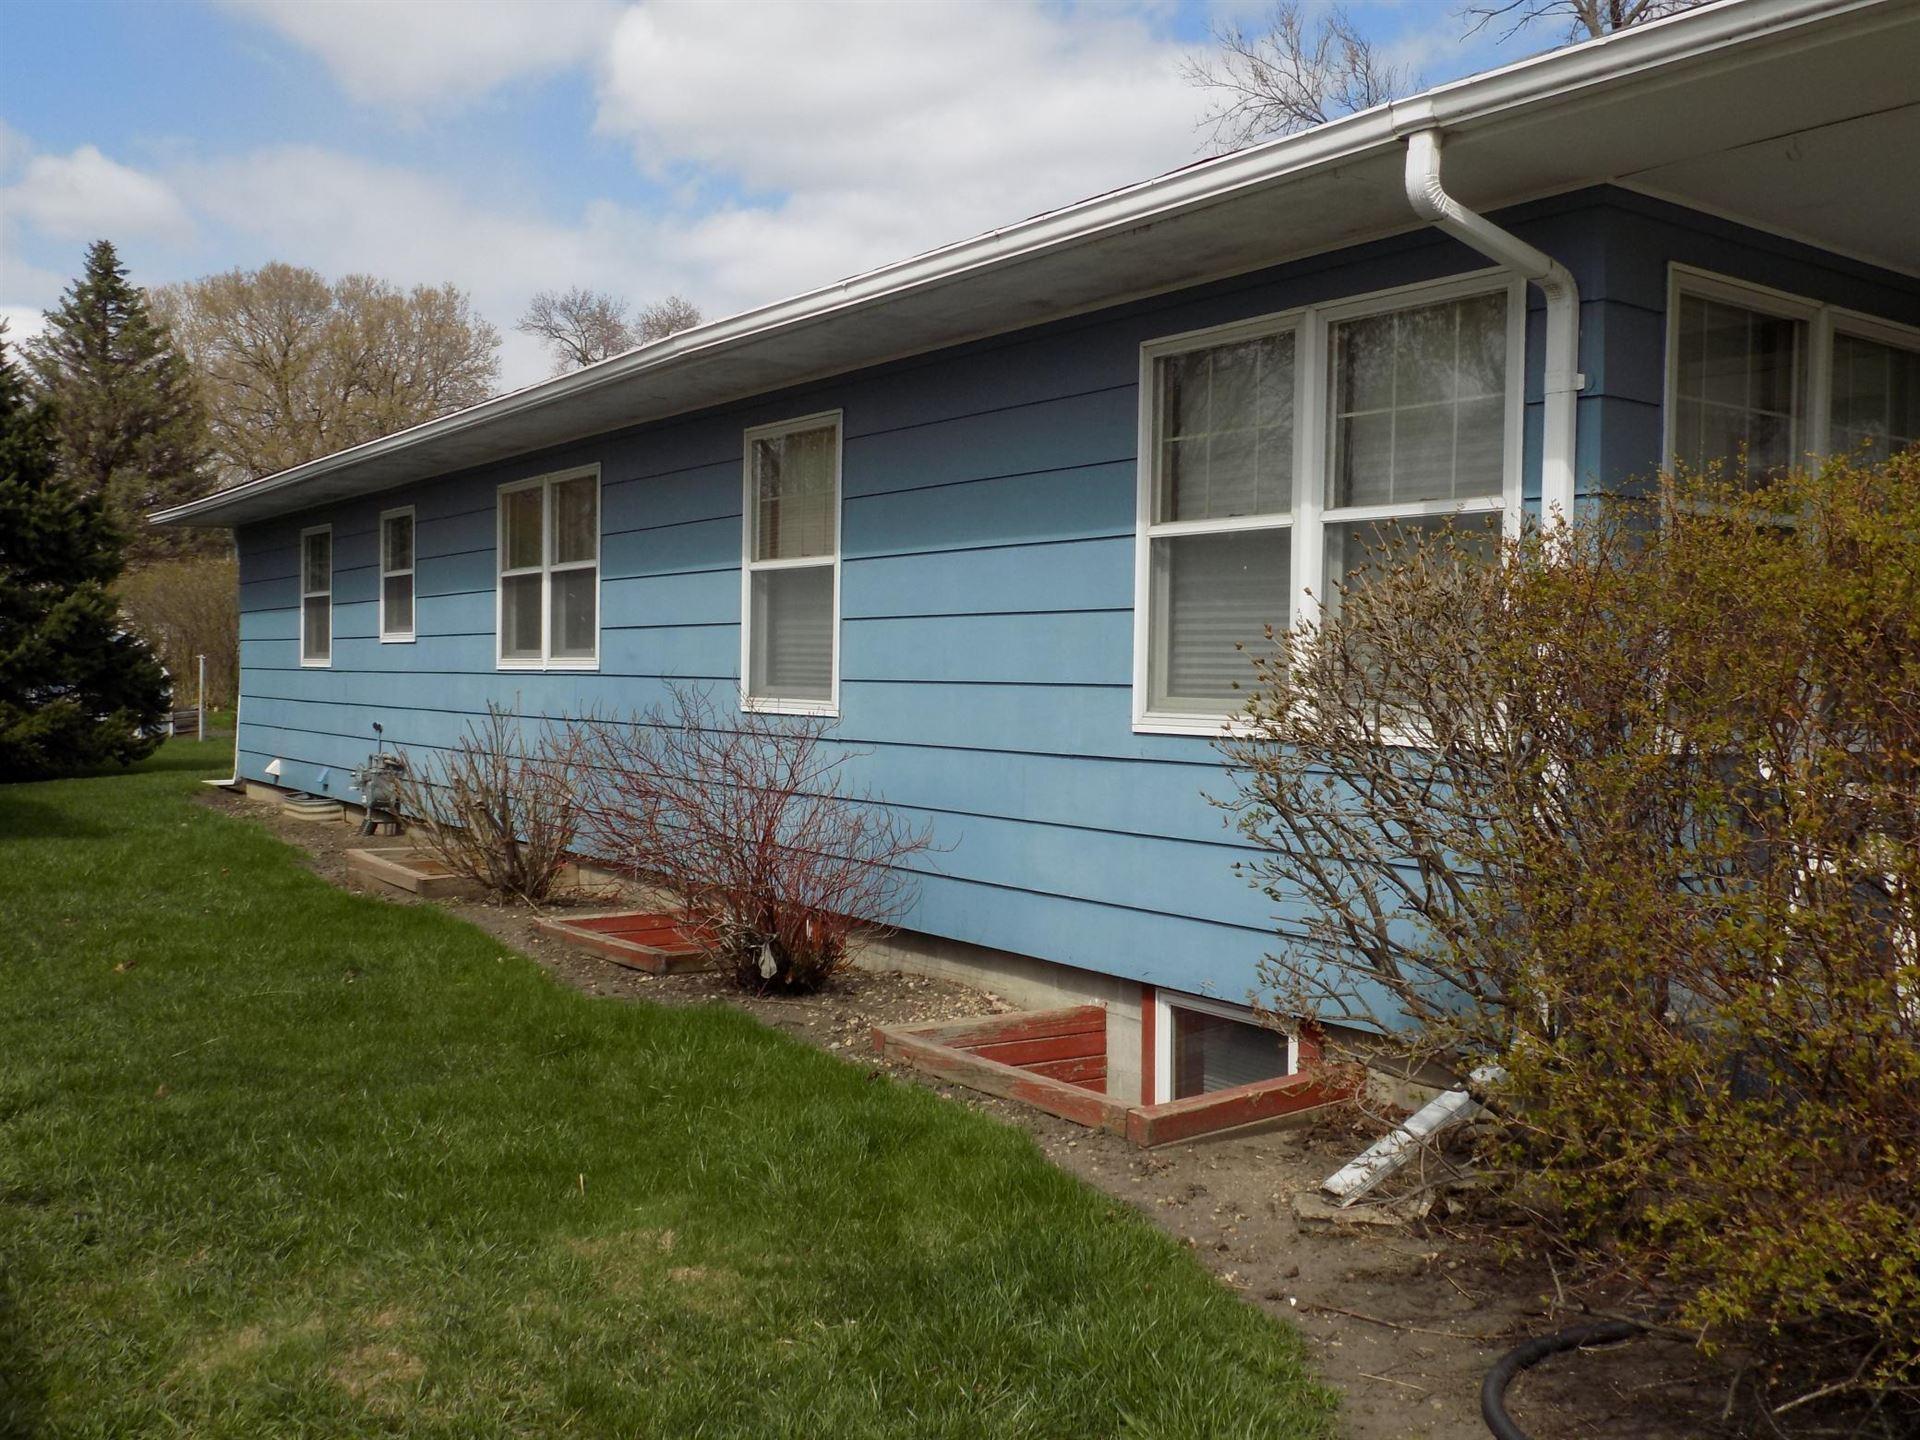 Photo of 110 W Anna Street, Fairmont, MN 56031 (MLS # 5721927)